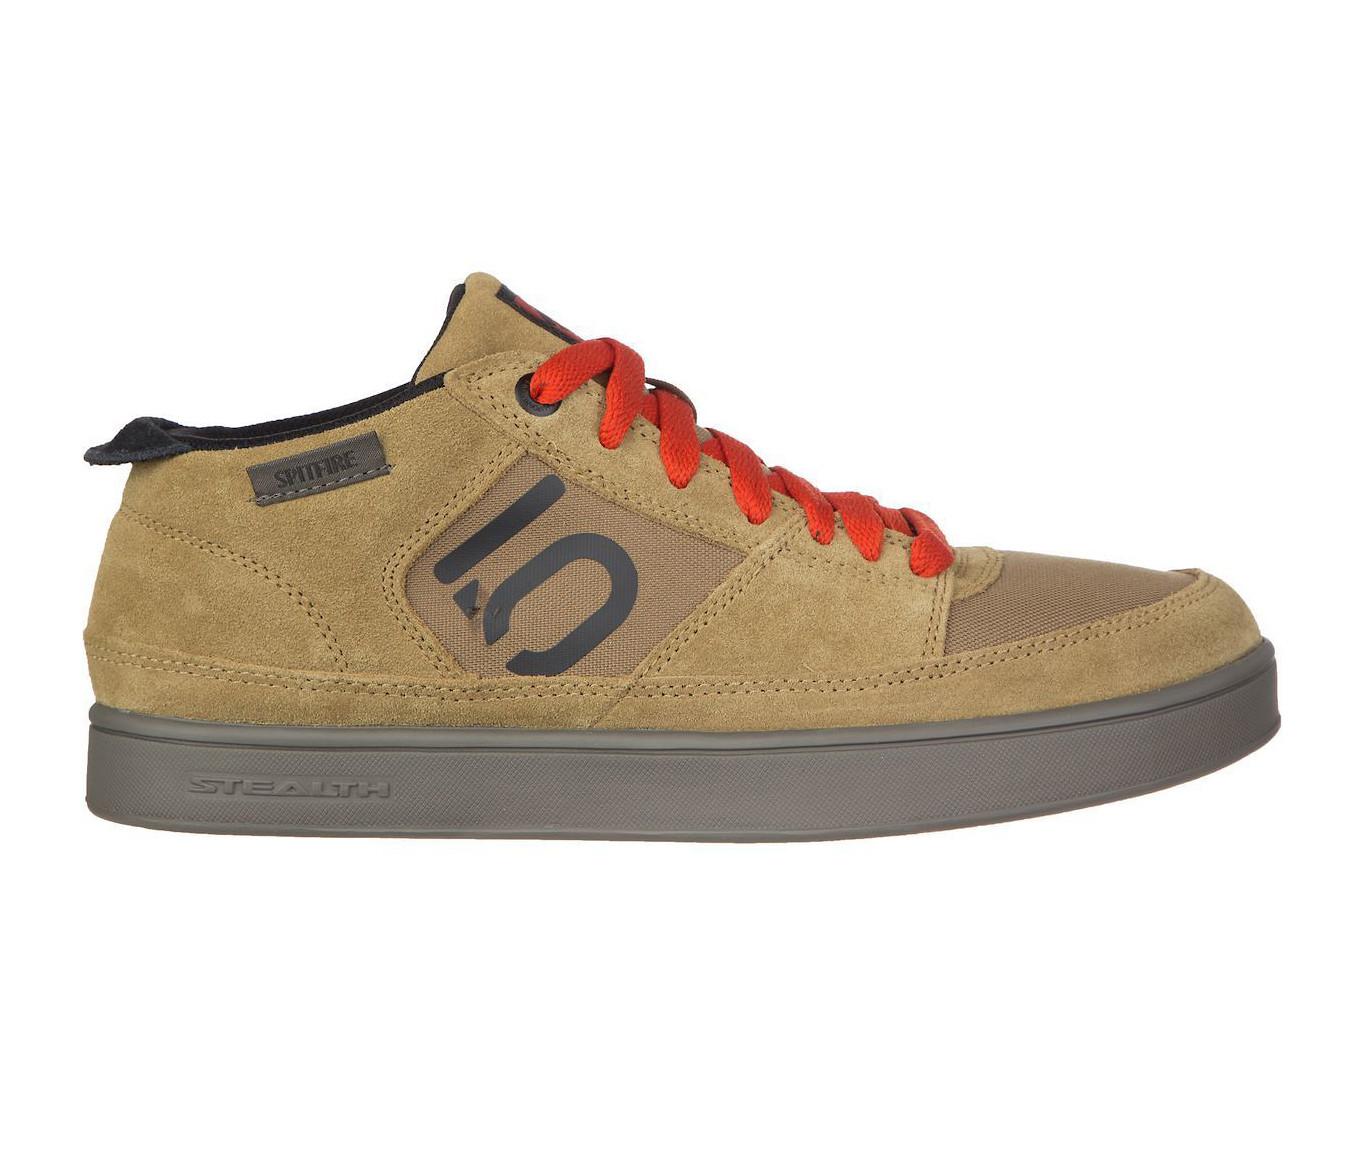 Five Ten Spitfire Men's Shoe - Craft Khaki